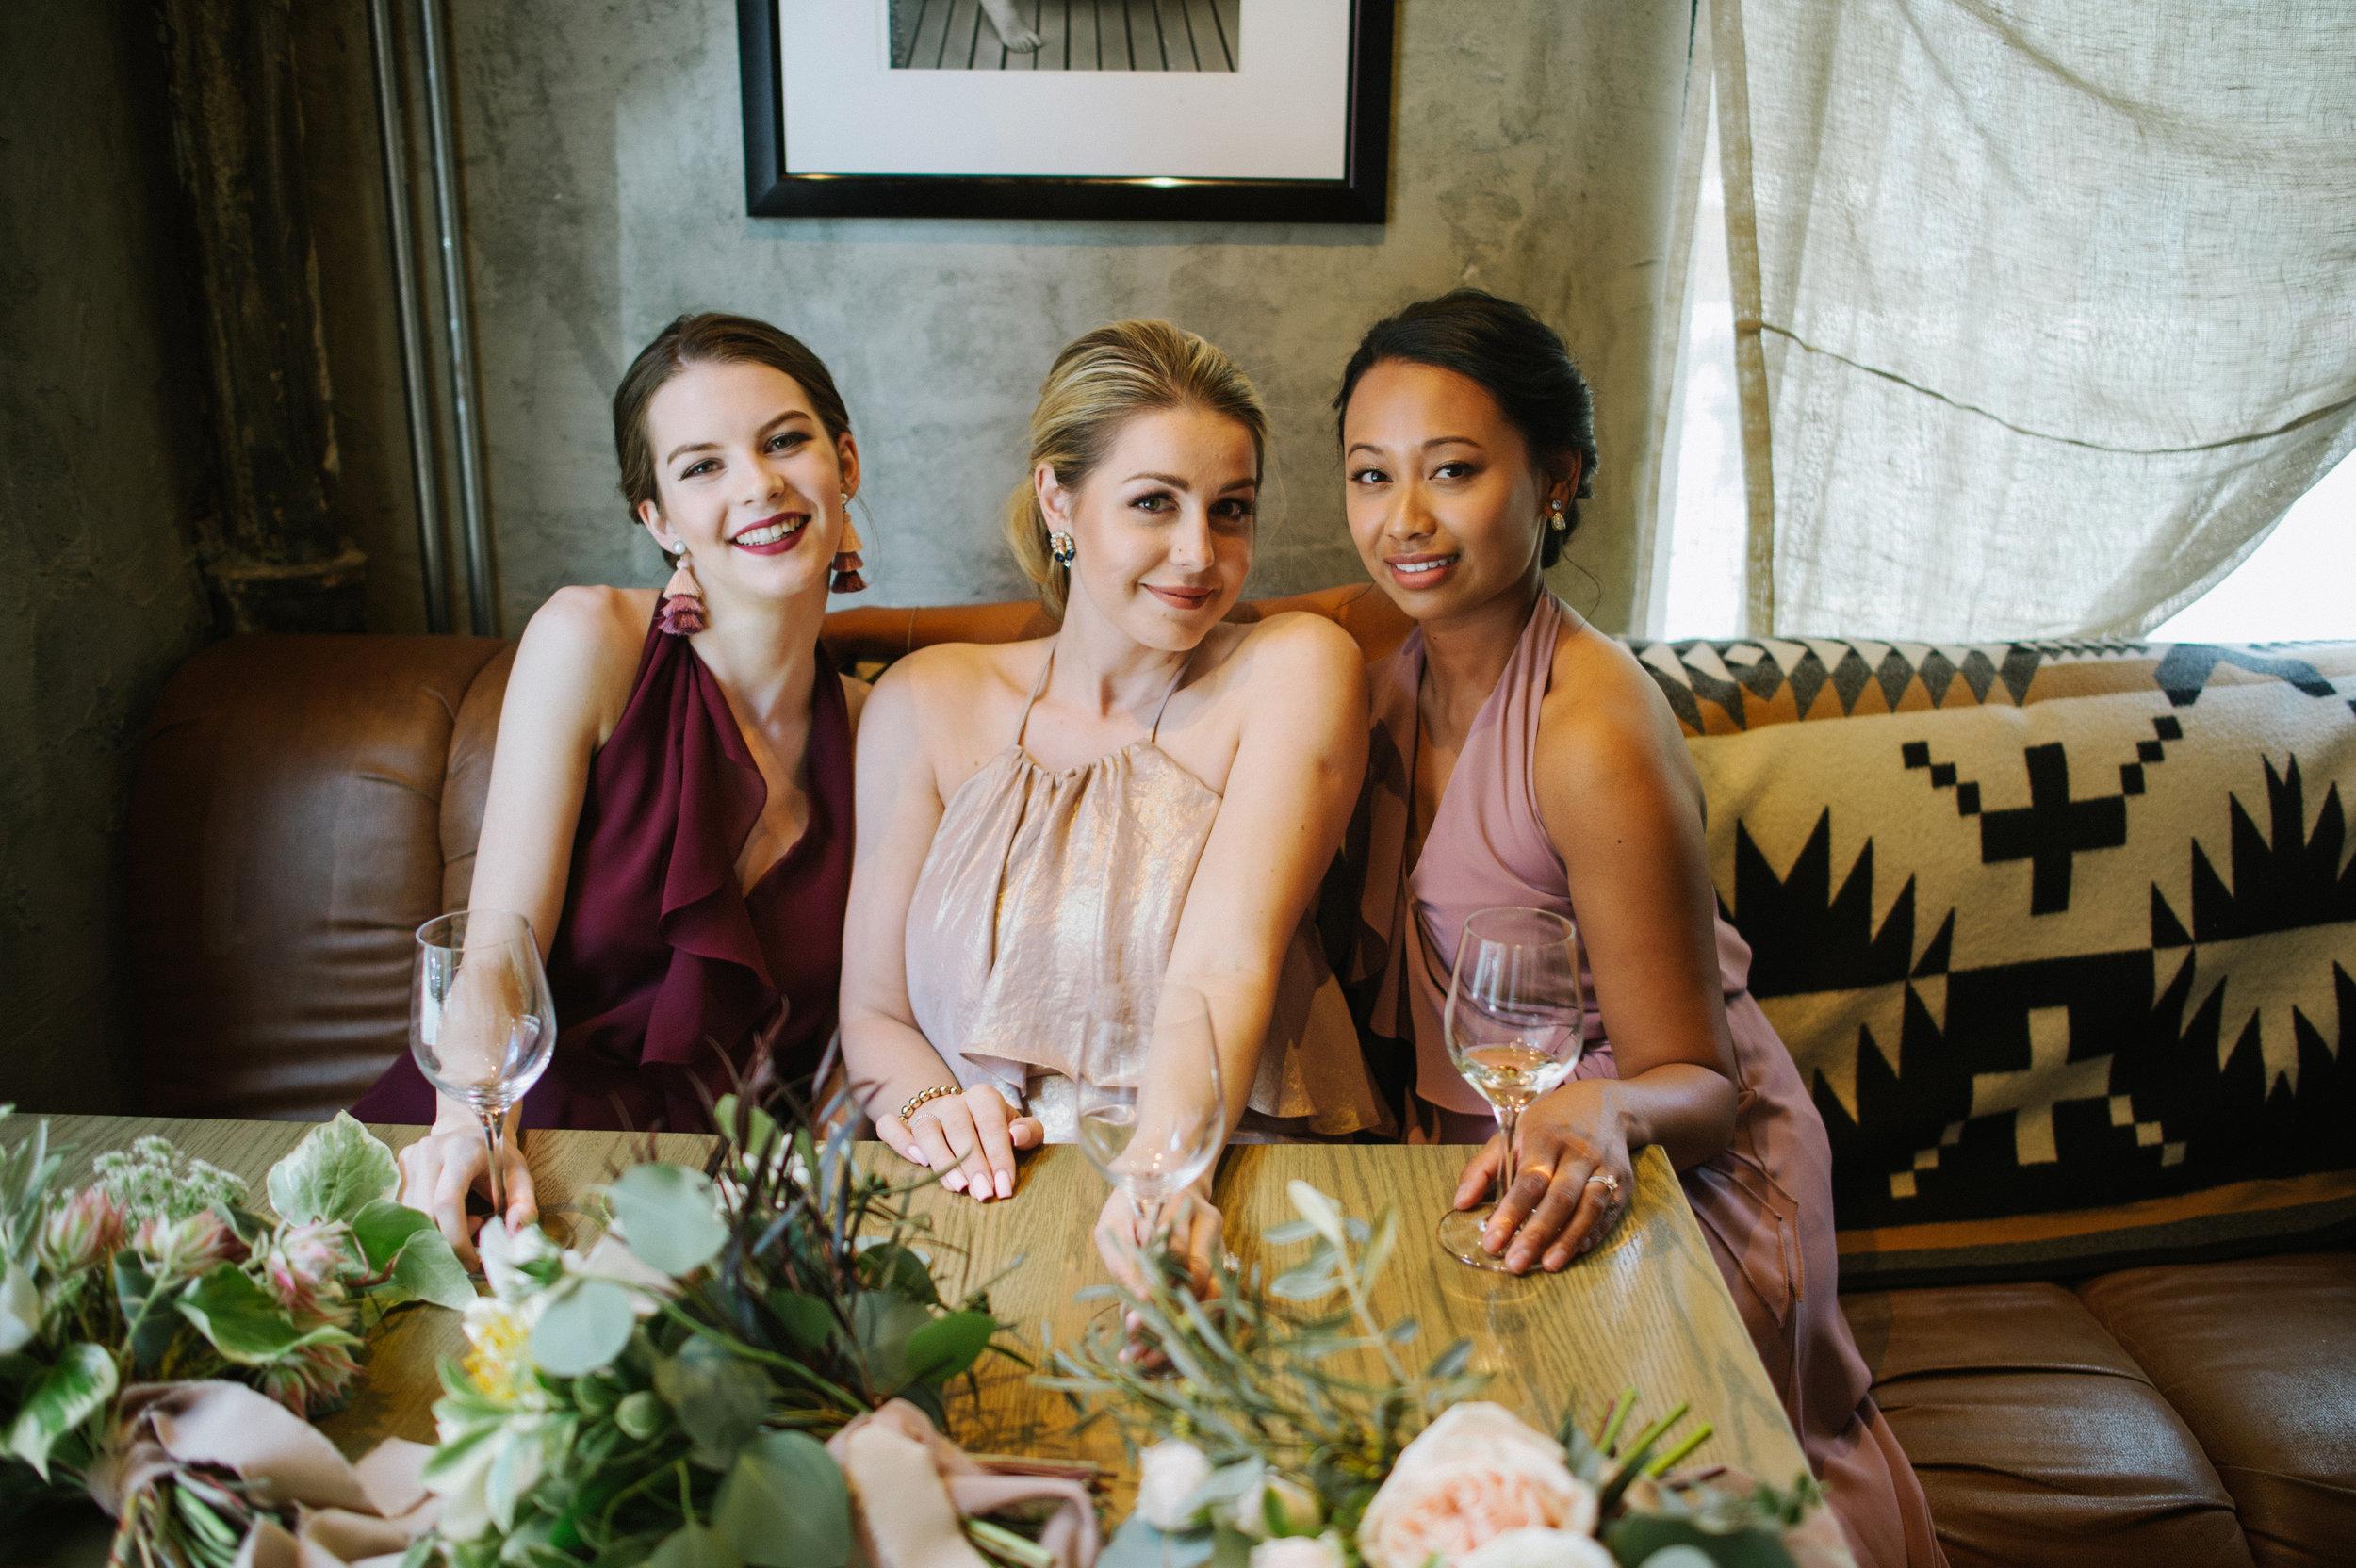 Calgary_Wedding_Photography_Bridgette_Bar_Bridesmaids_Shoot_2018_HR095.jpg